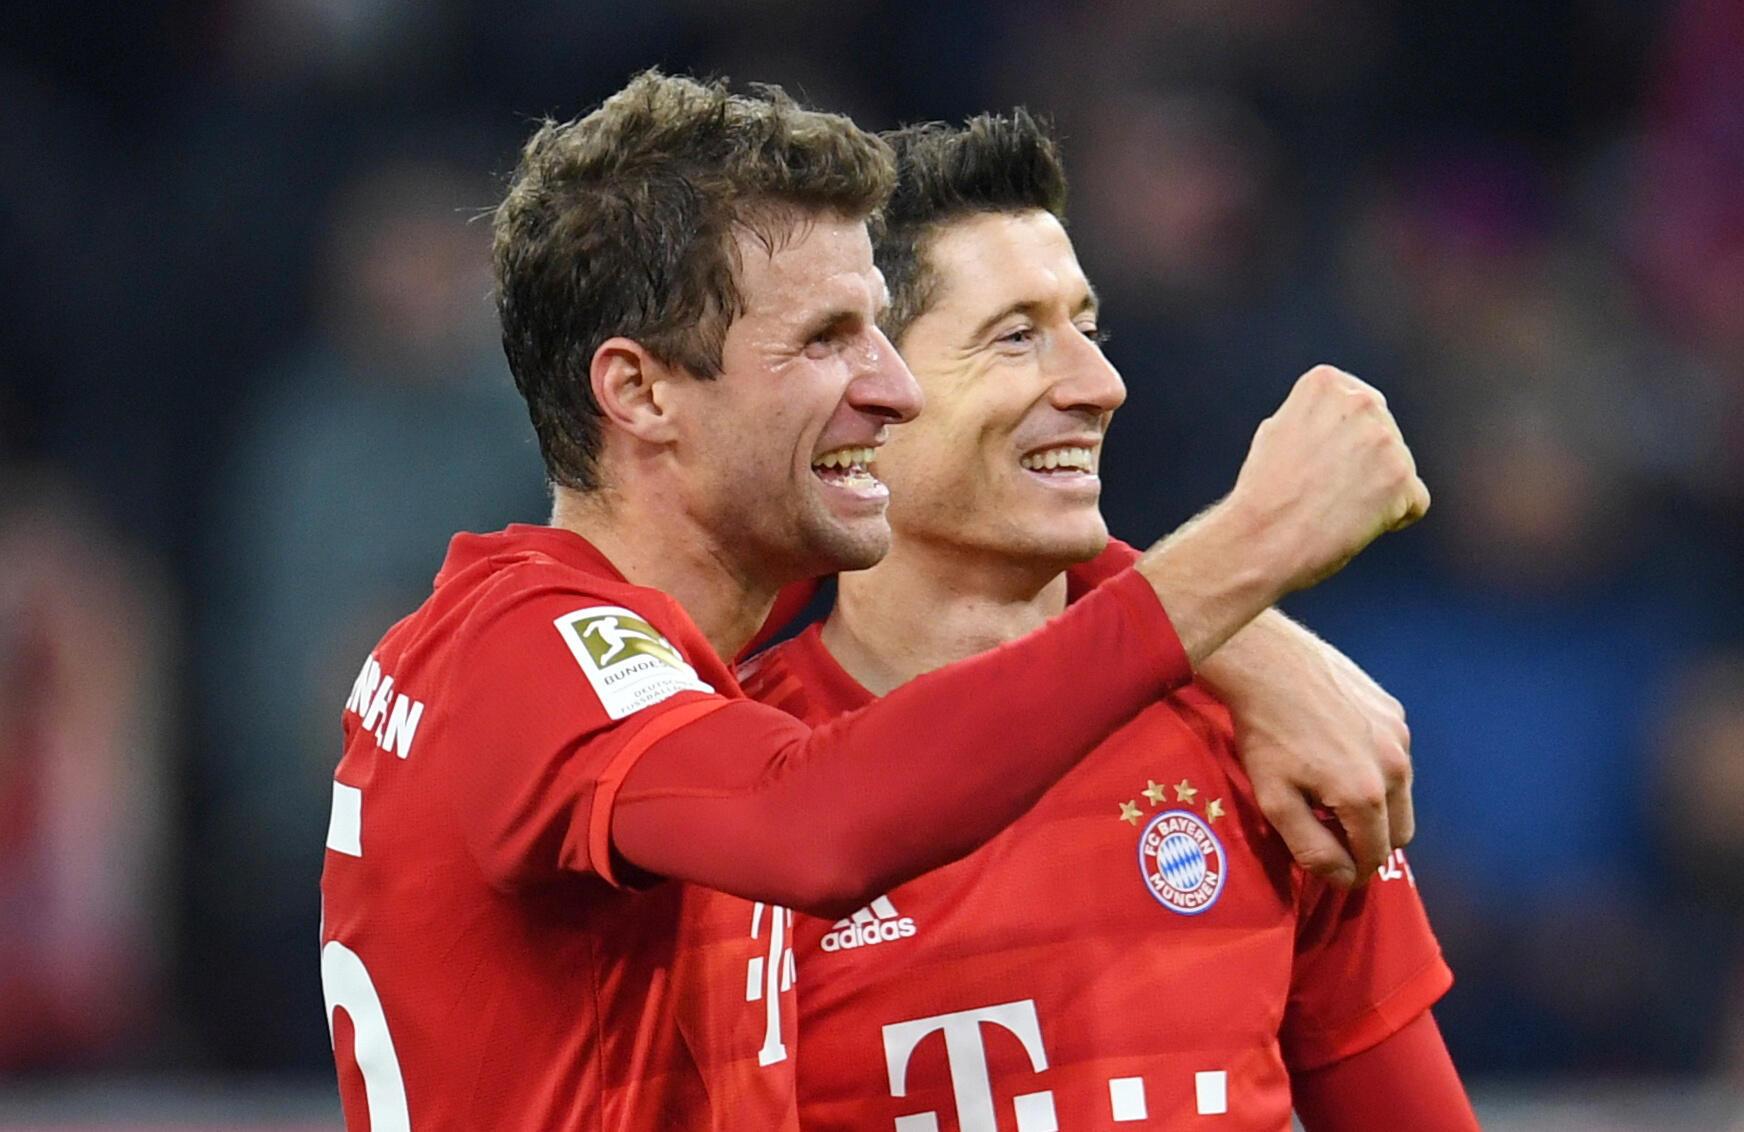 Thomas Müller et Robert Lewandowski (Bayern Munich), lors du match contre Dortmund (4-0), le 9 novembre 2019.